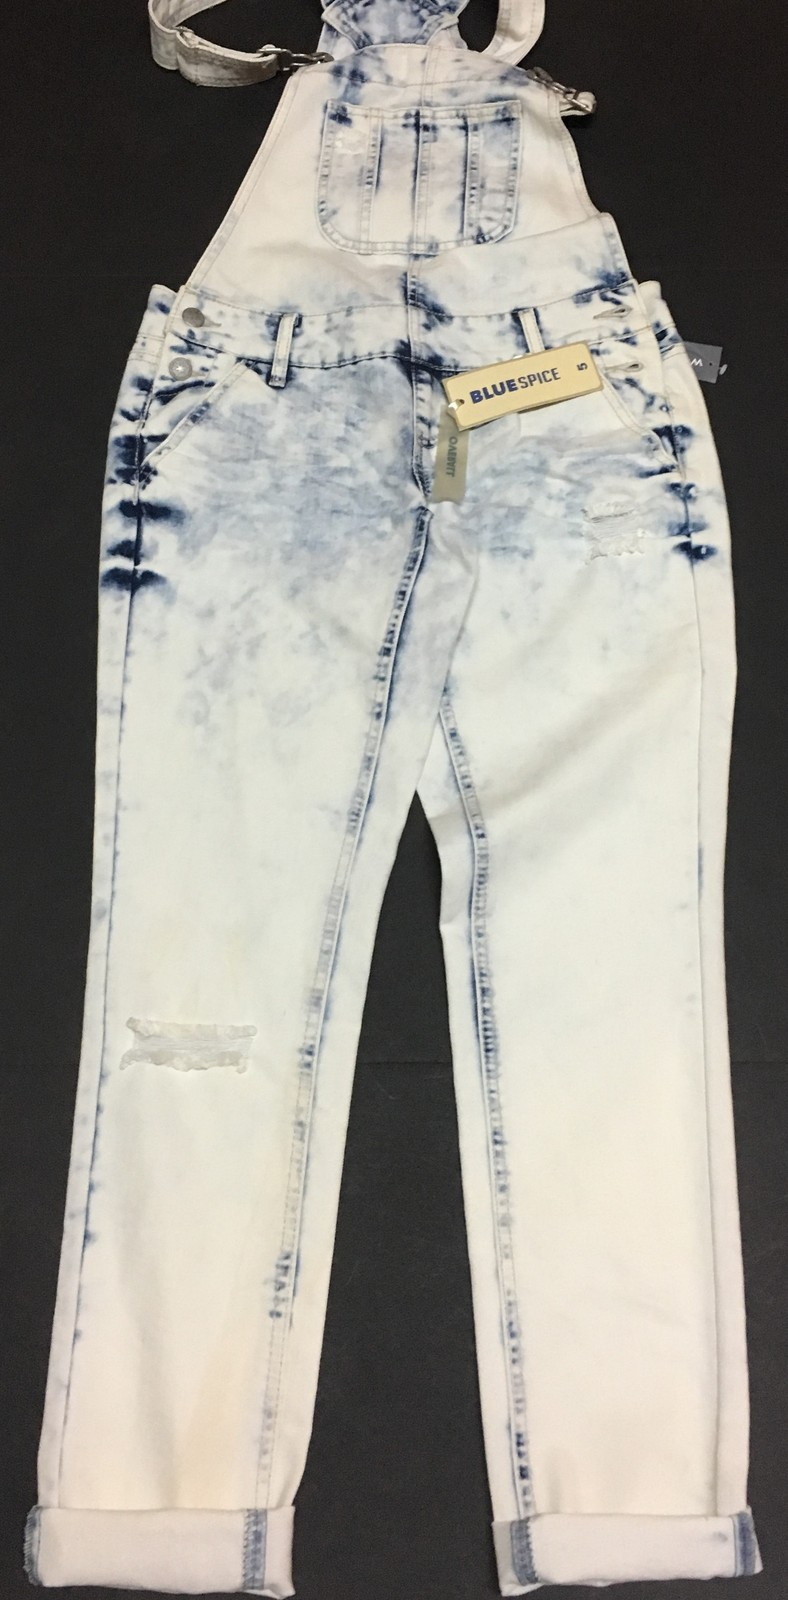 Blue Spice Jean Overalls Juniors Sz 5 Cloud Blue Distressed NWT